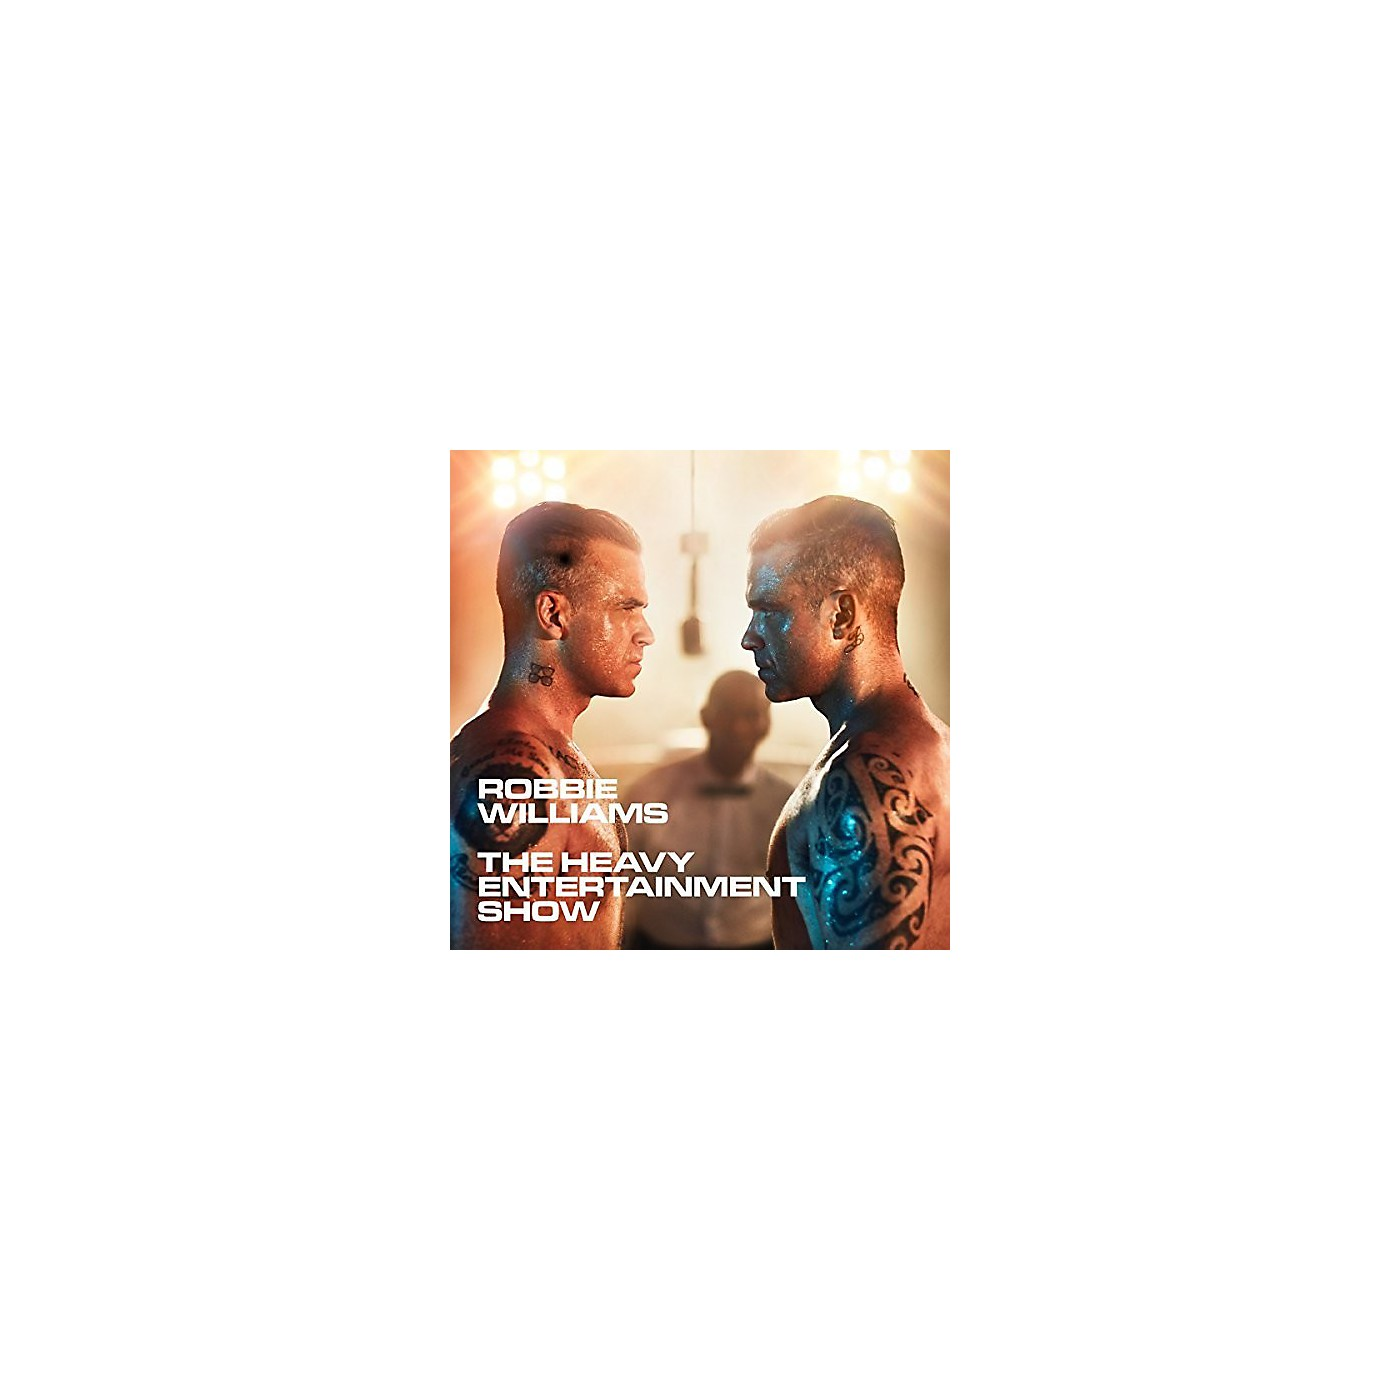 Alliance Robbie Williams - Heavy Entertainment Show thumbnail